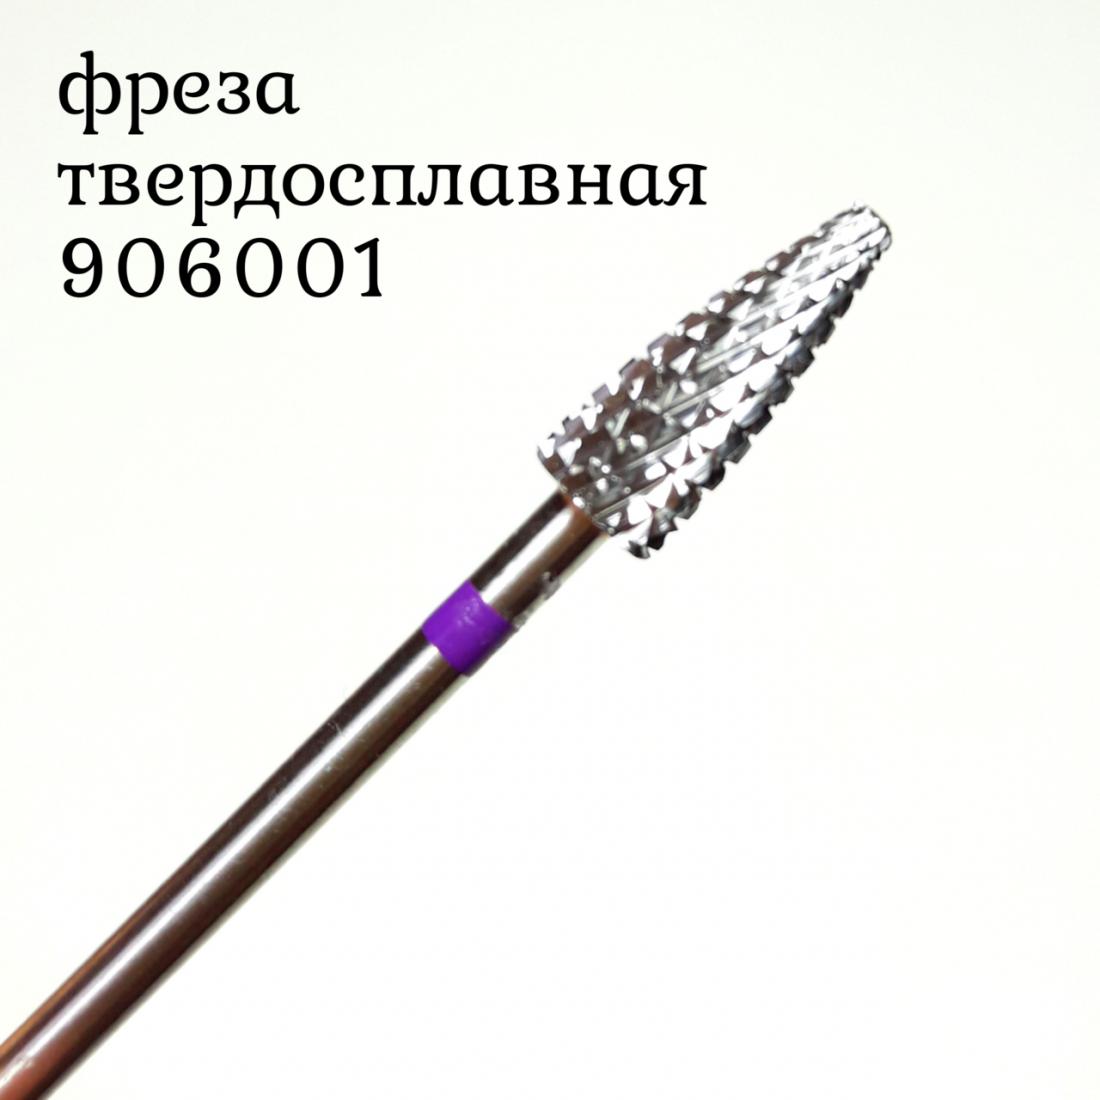 Фреза 906001 Владмива фиолетовая